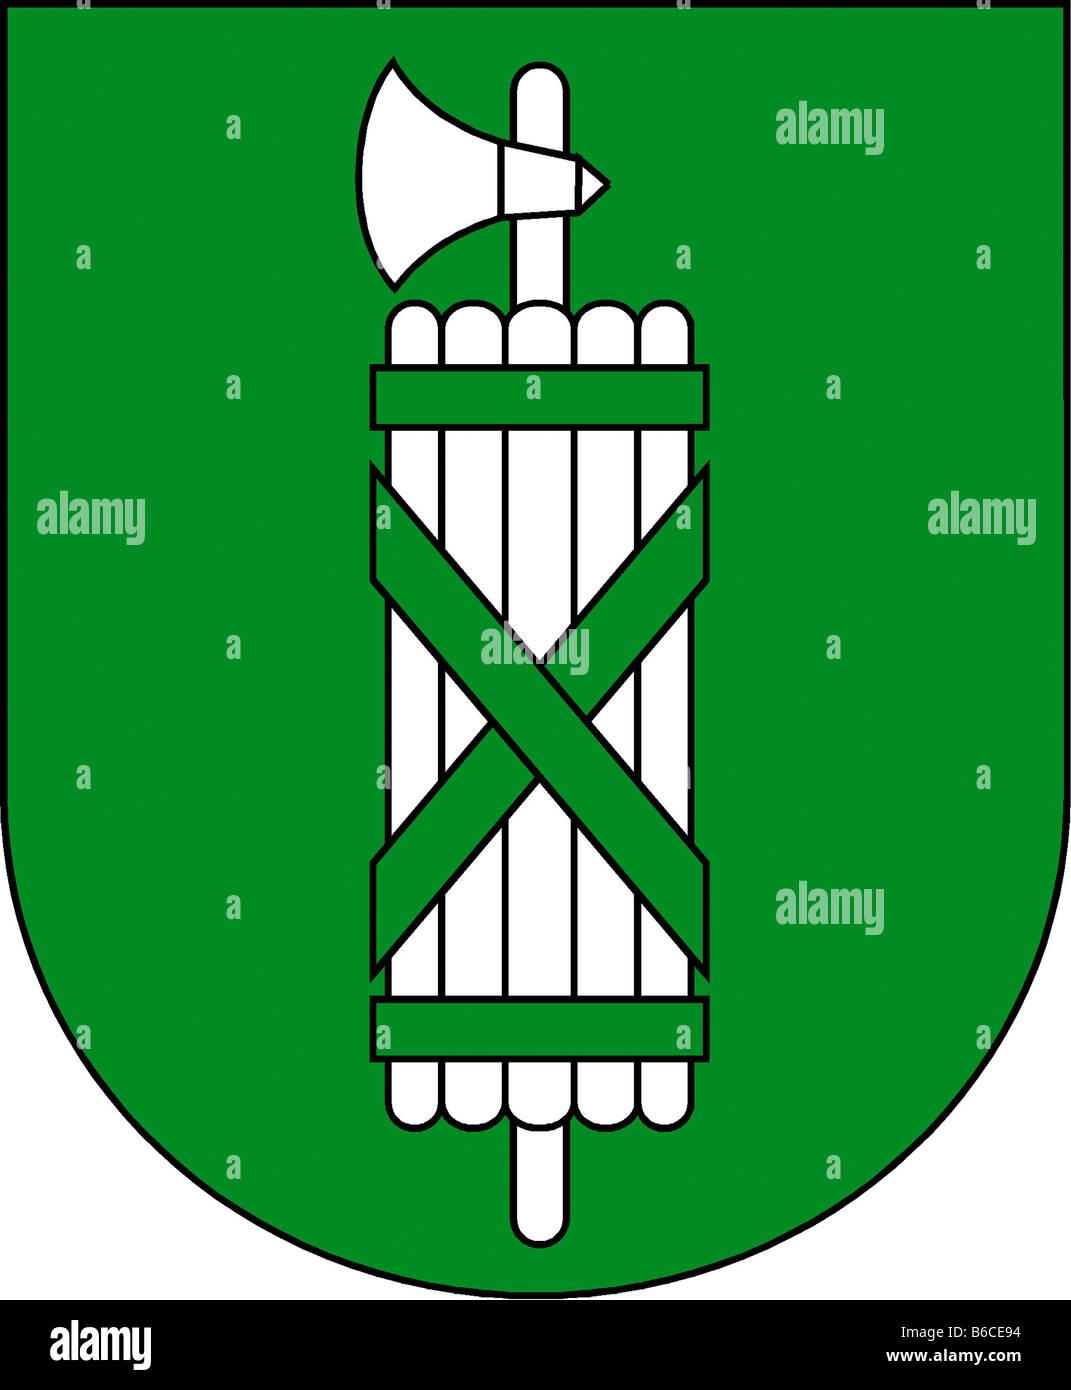 illustration flag of canton of saint gallen switzerland - Stock Image